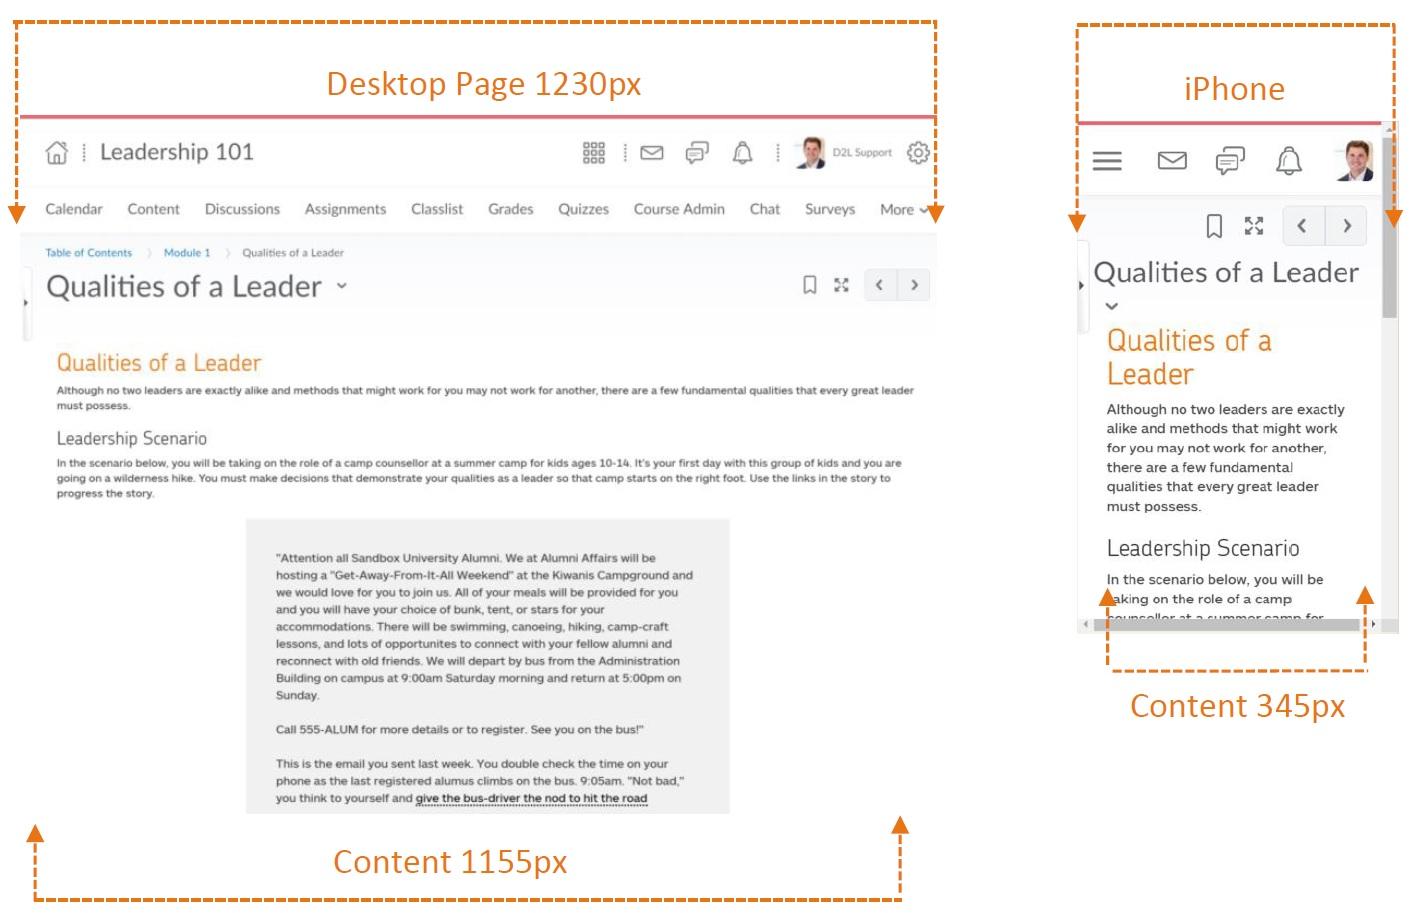 deesktop vs. mobile page width